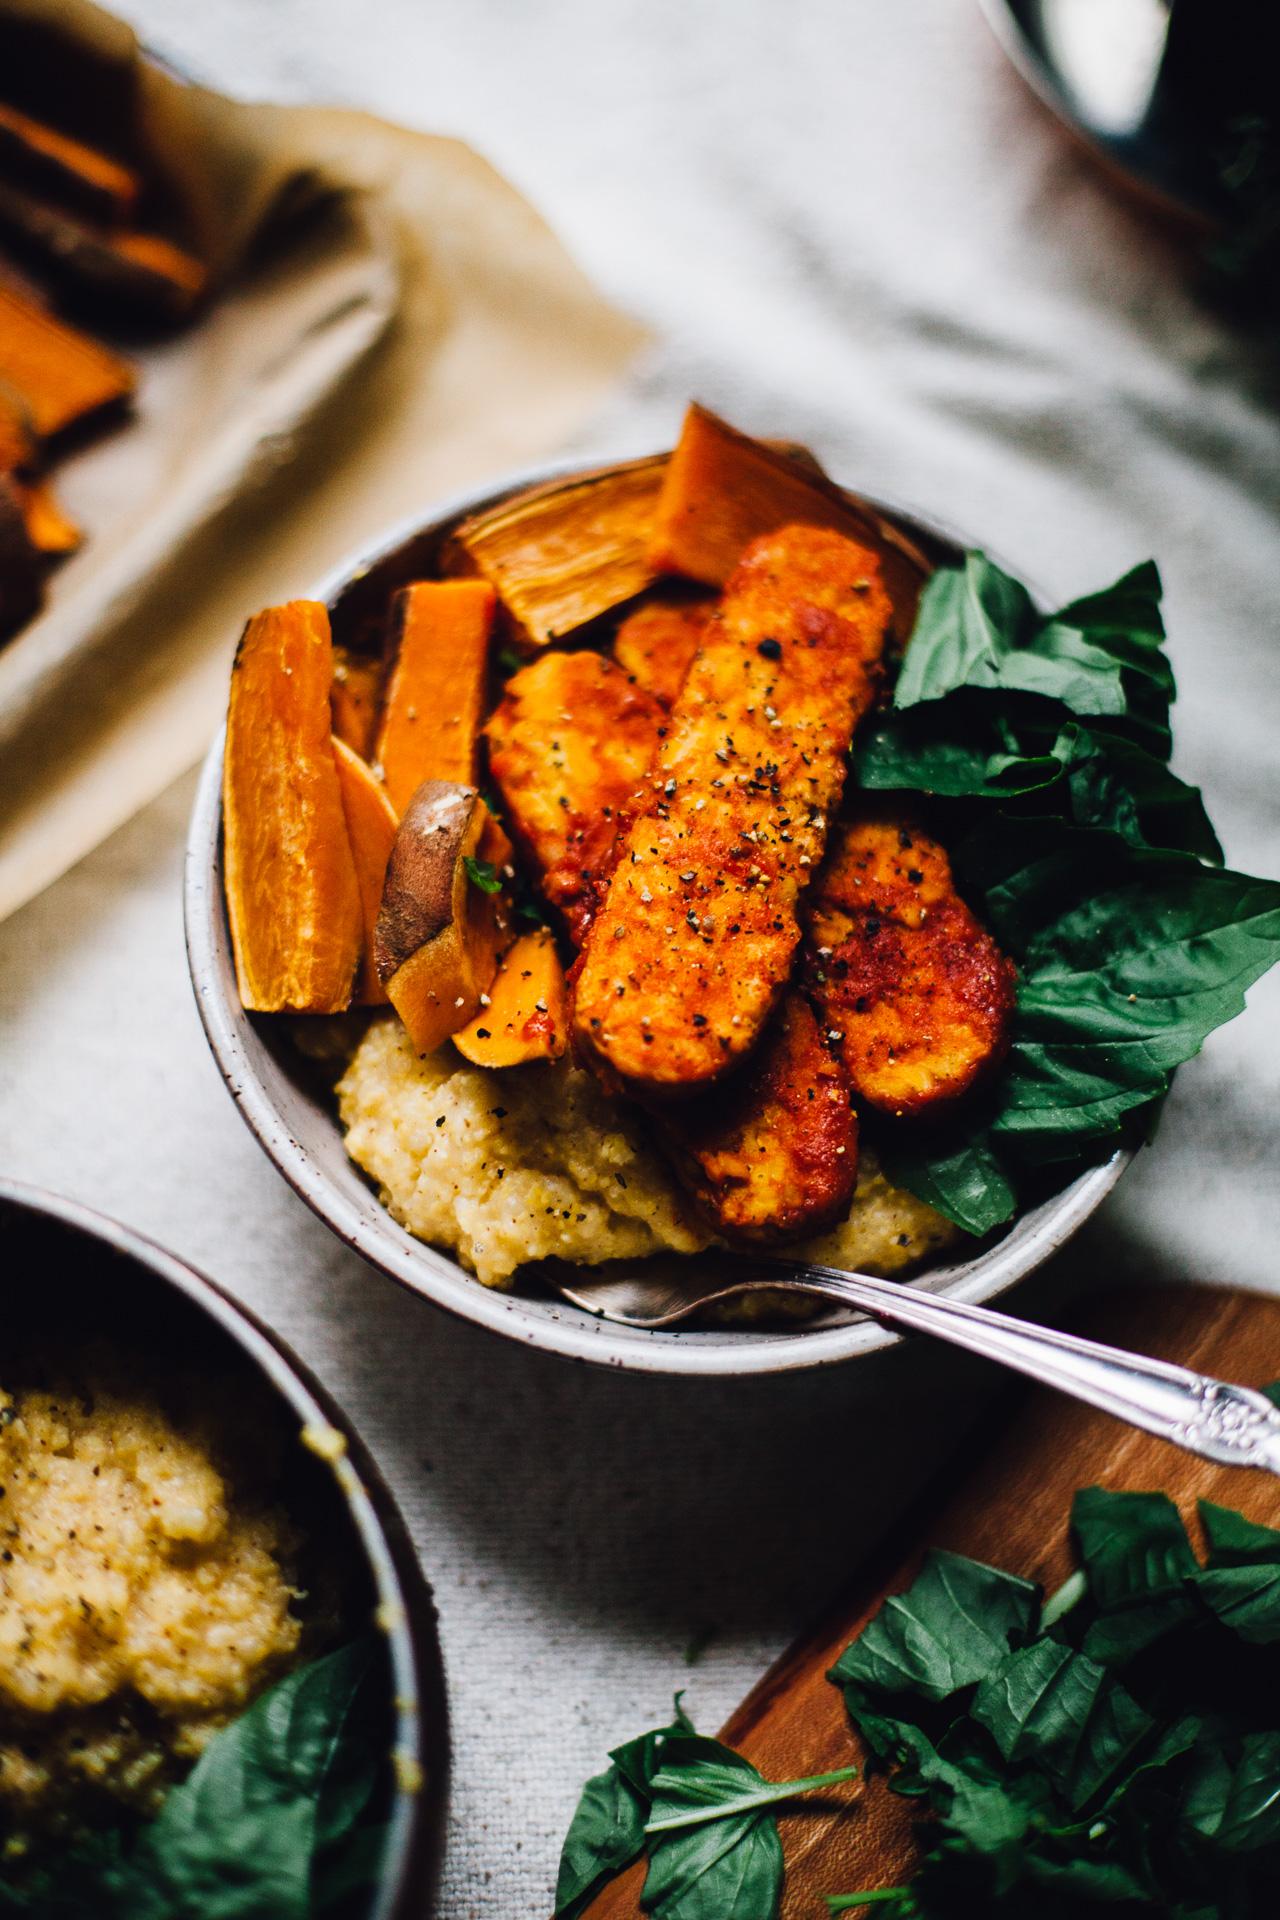 gochujang tempeh bowls with sweet potato, polenta and basil | recipe via willfrolicforfood.com